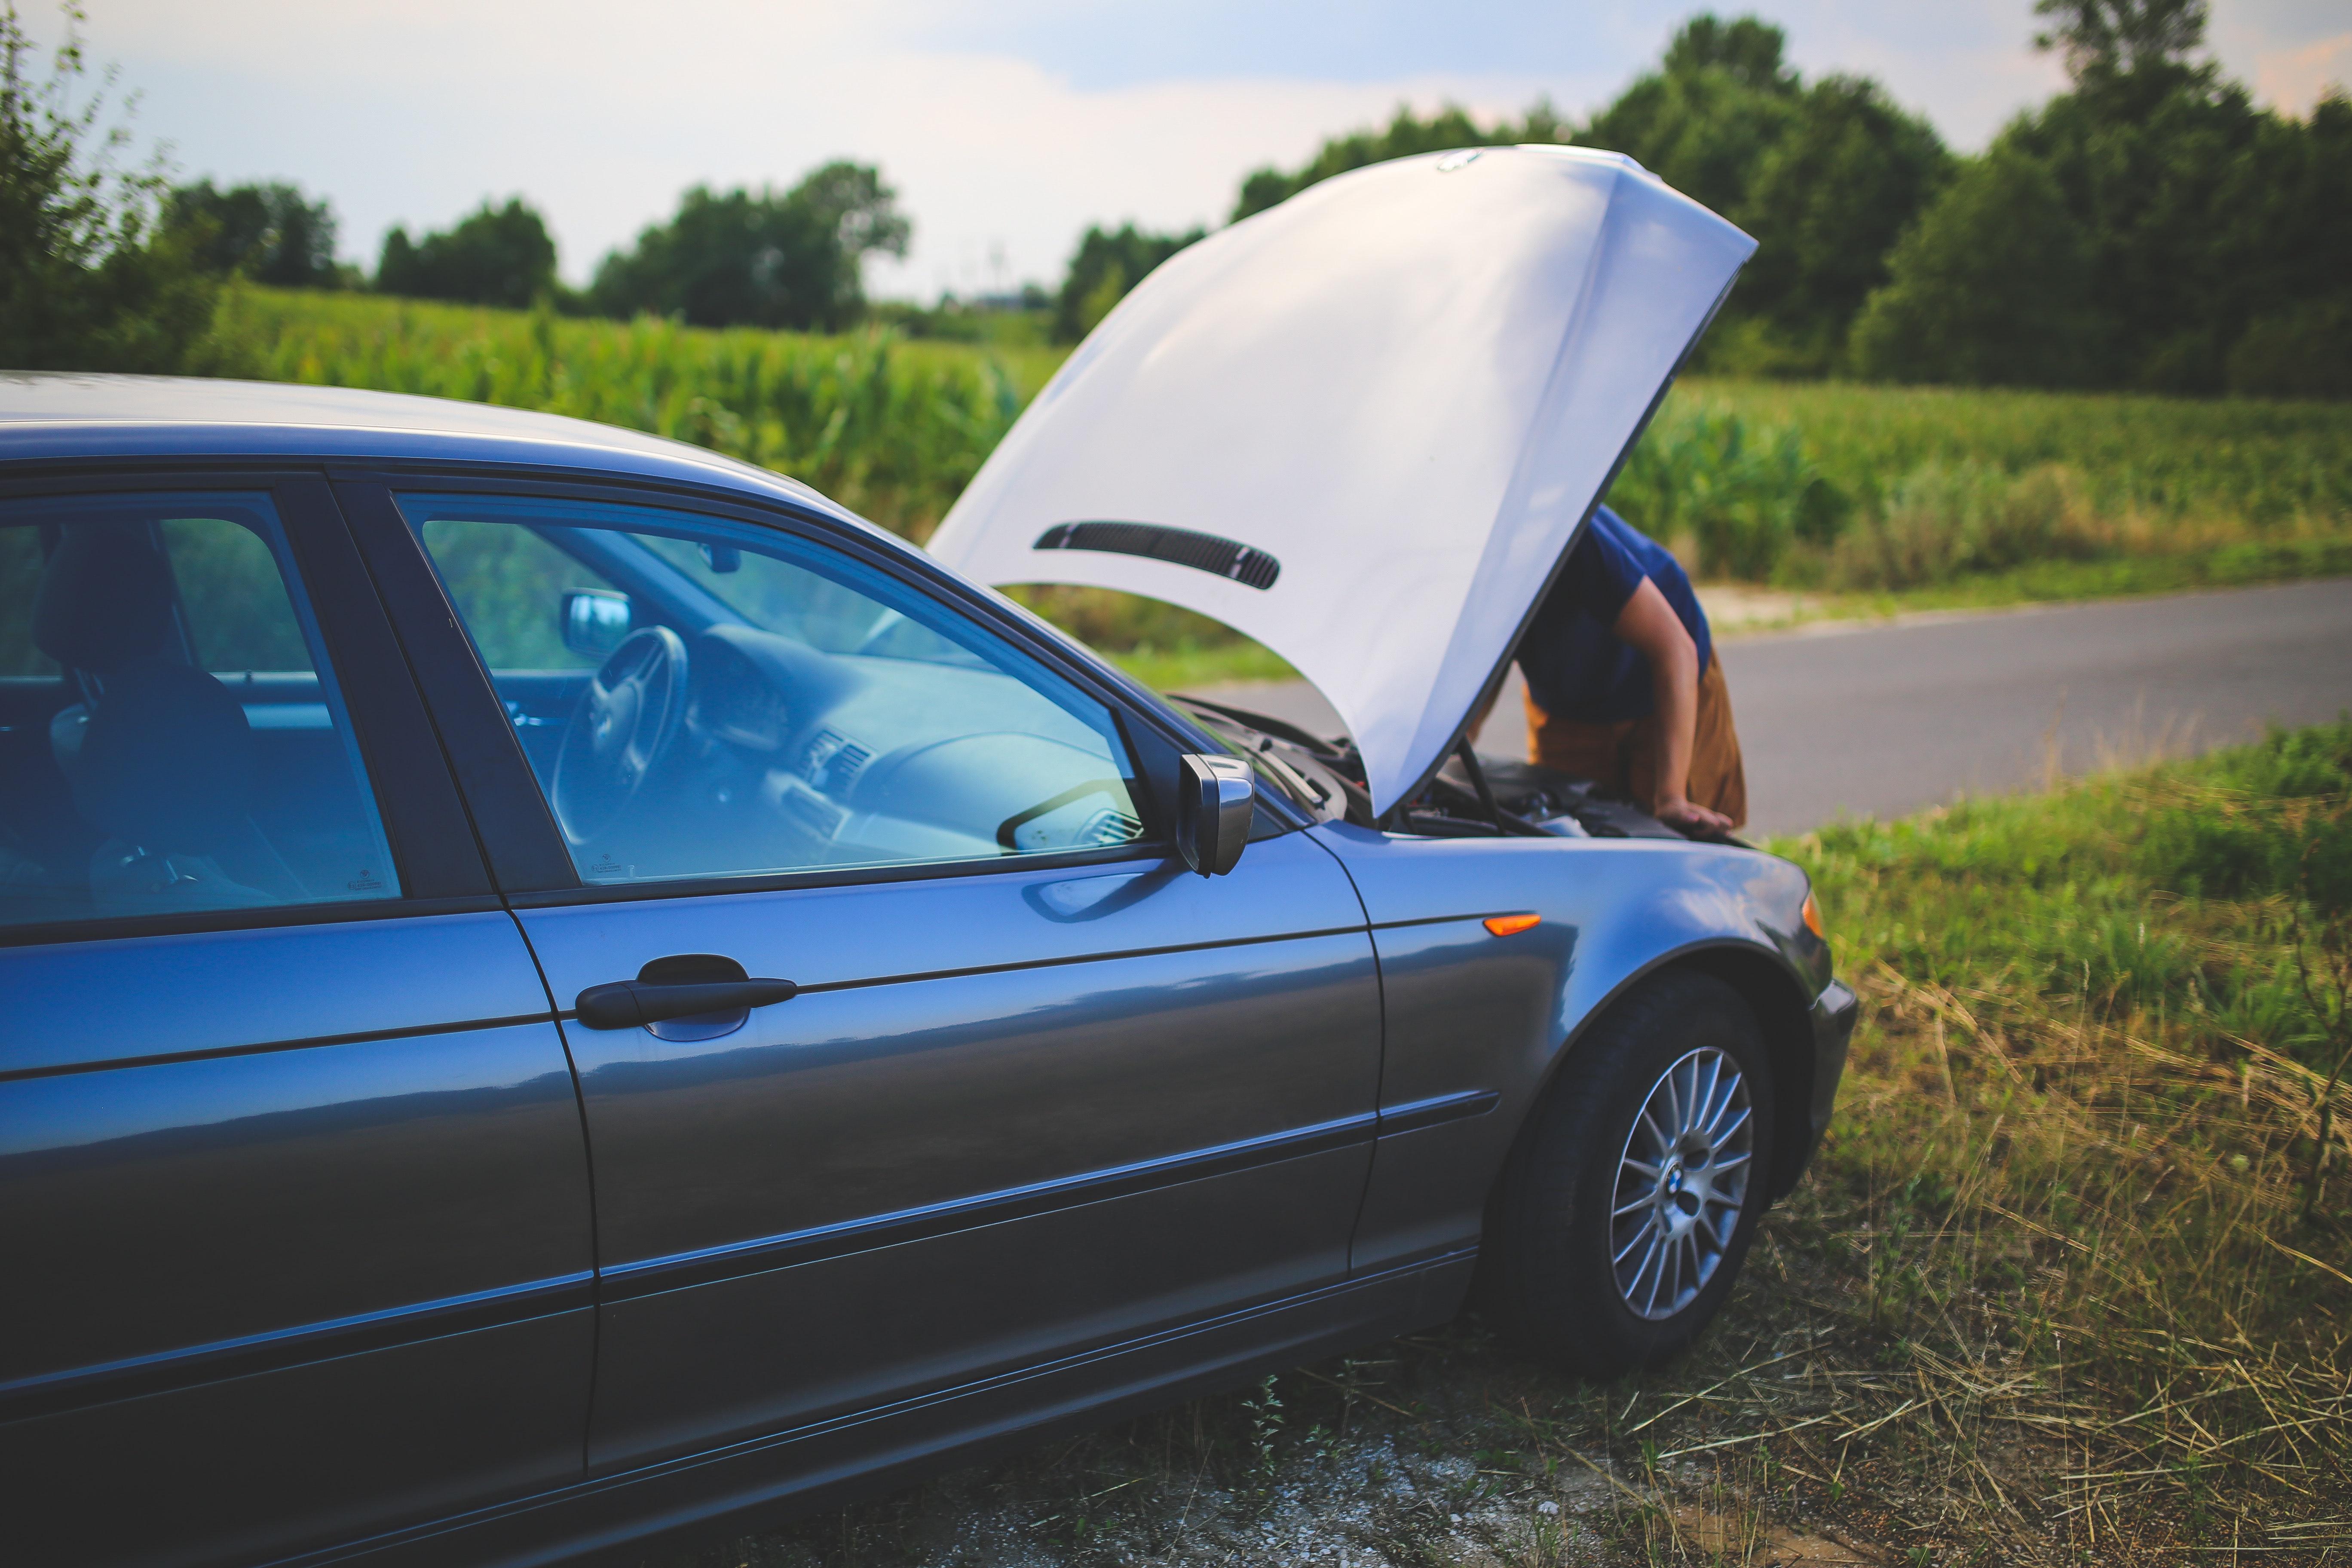 a damaged vehicle